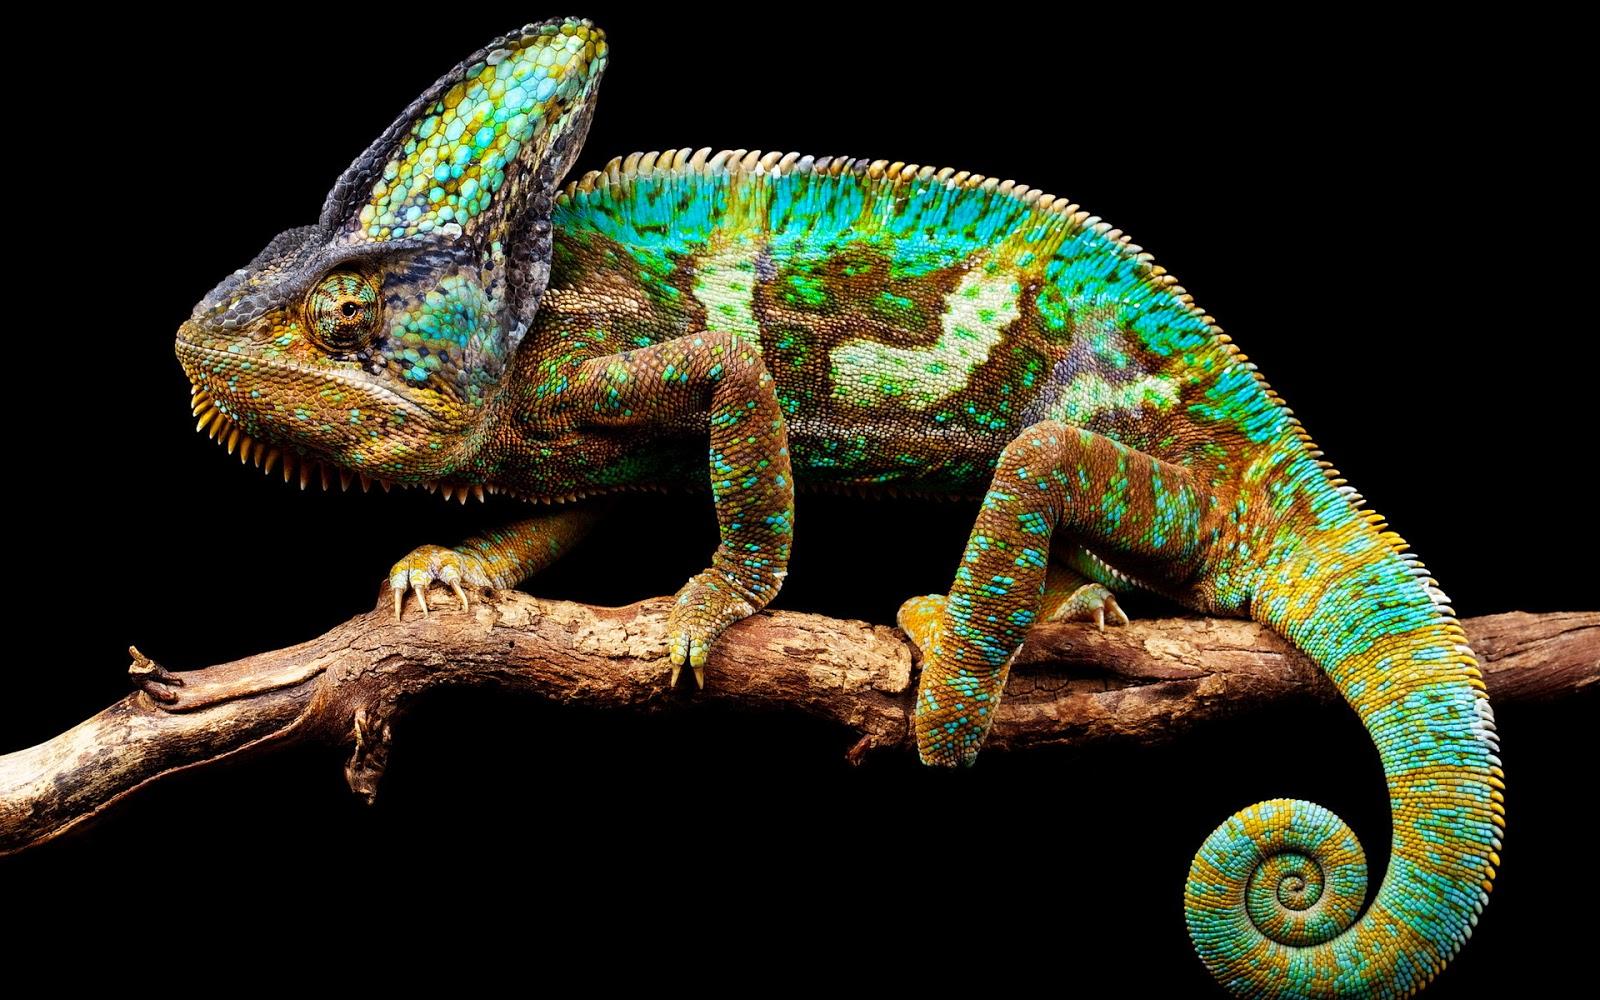 chameleon wallpaper 9661 - photo #9